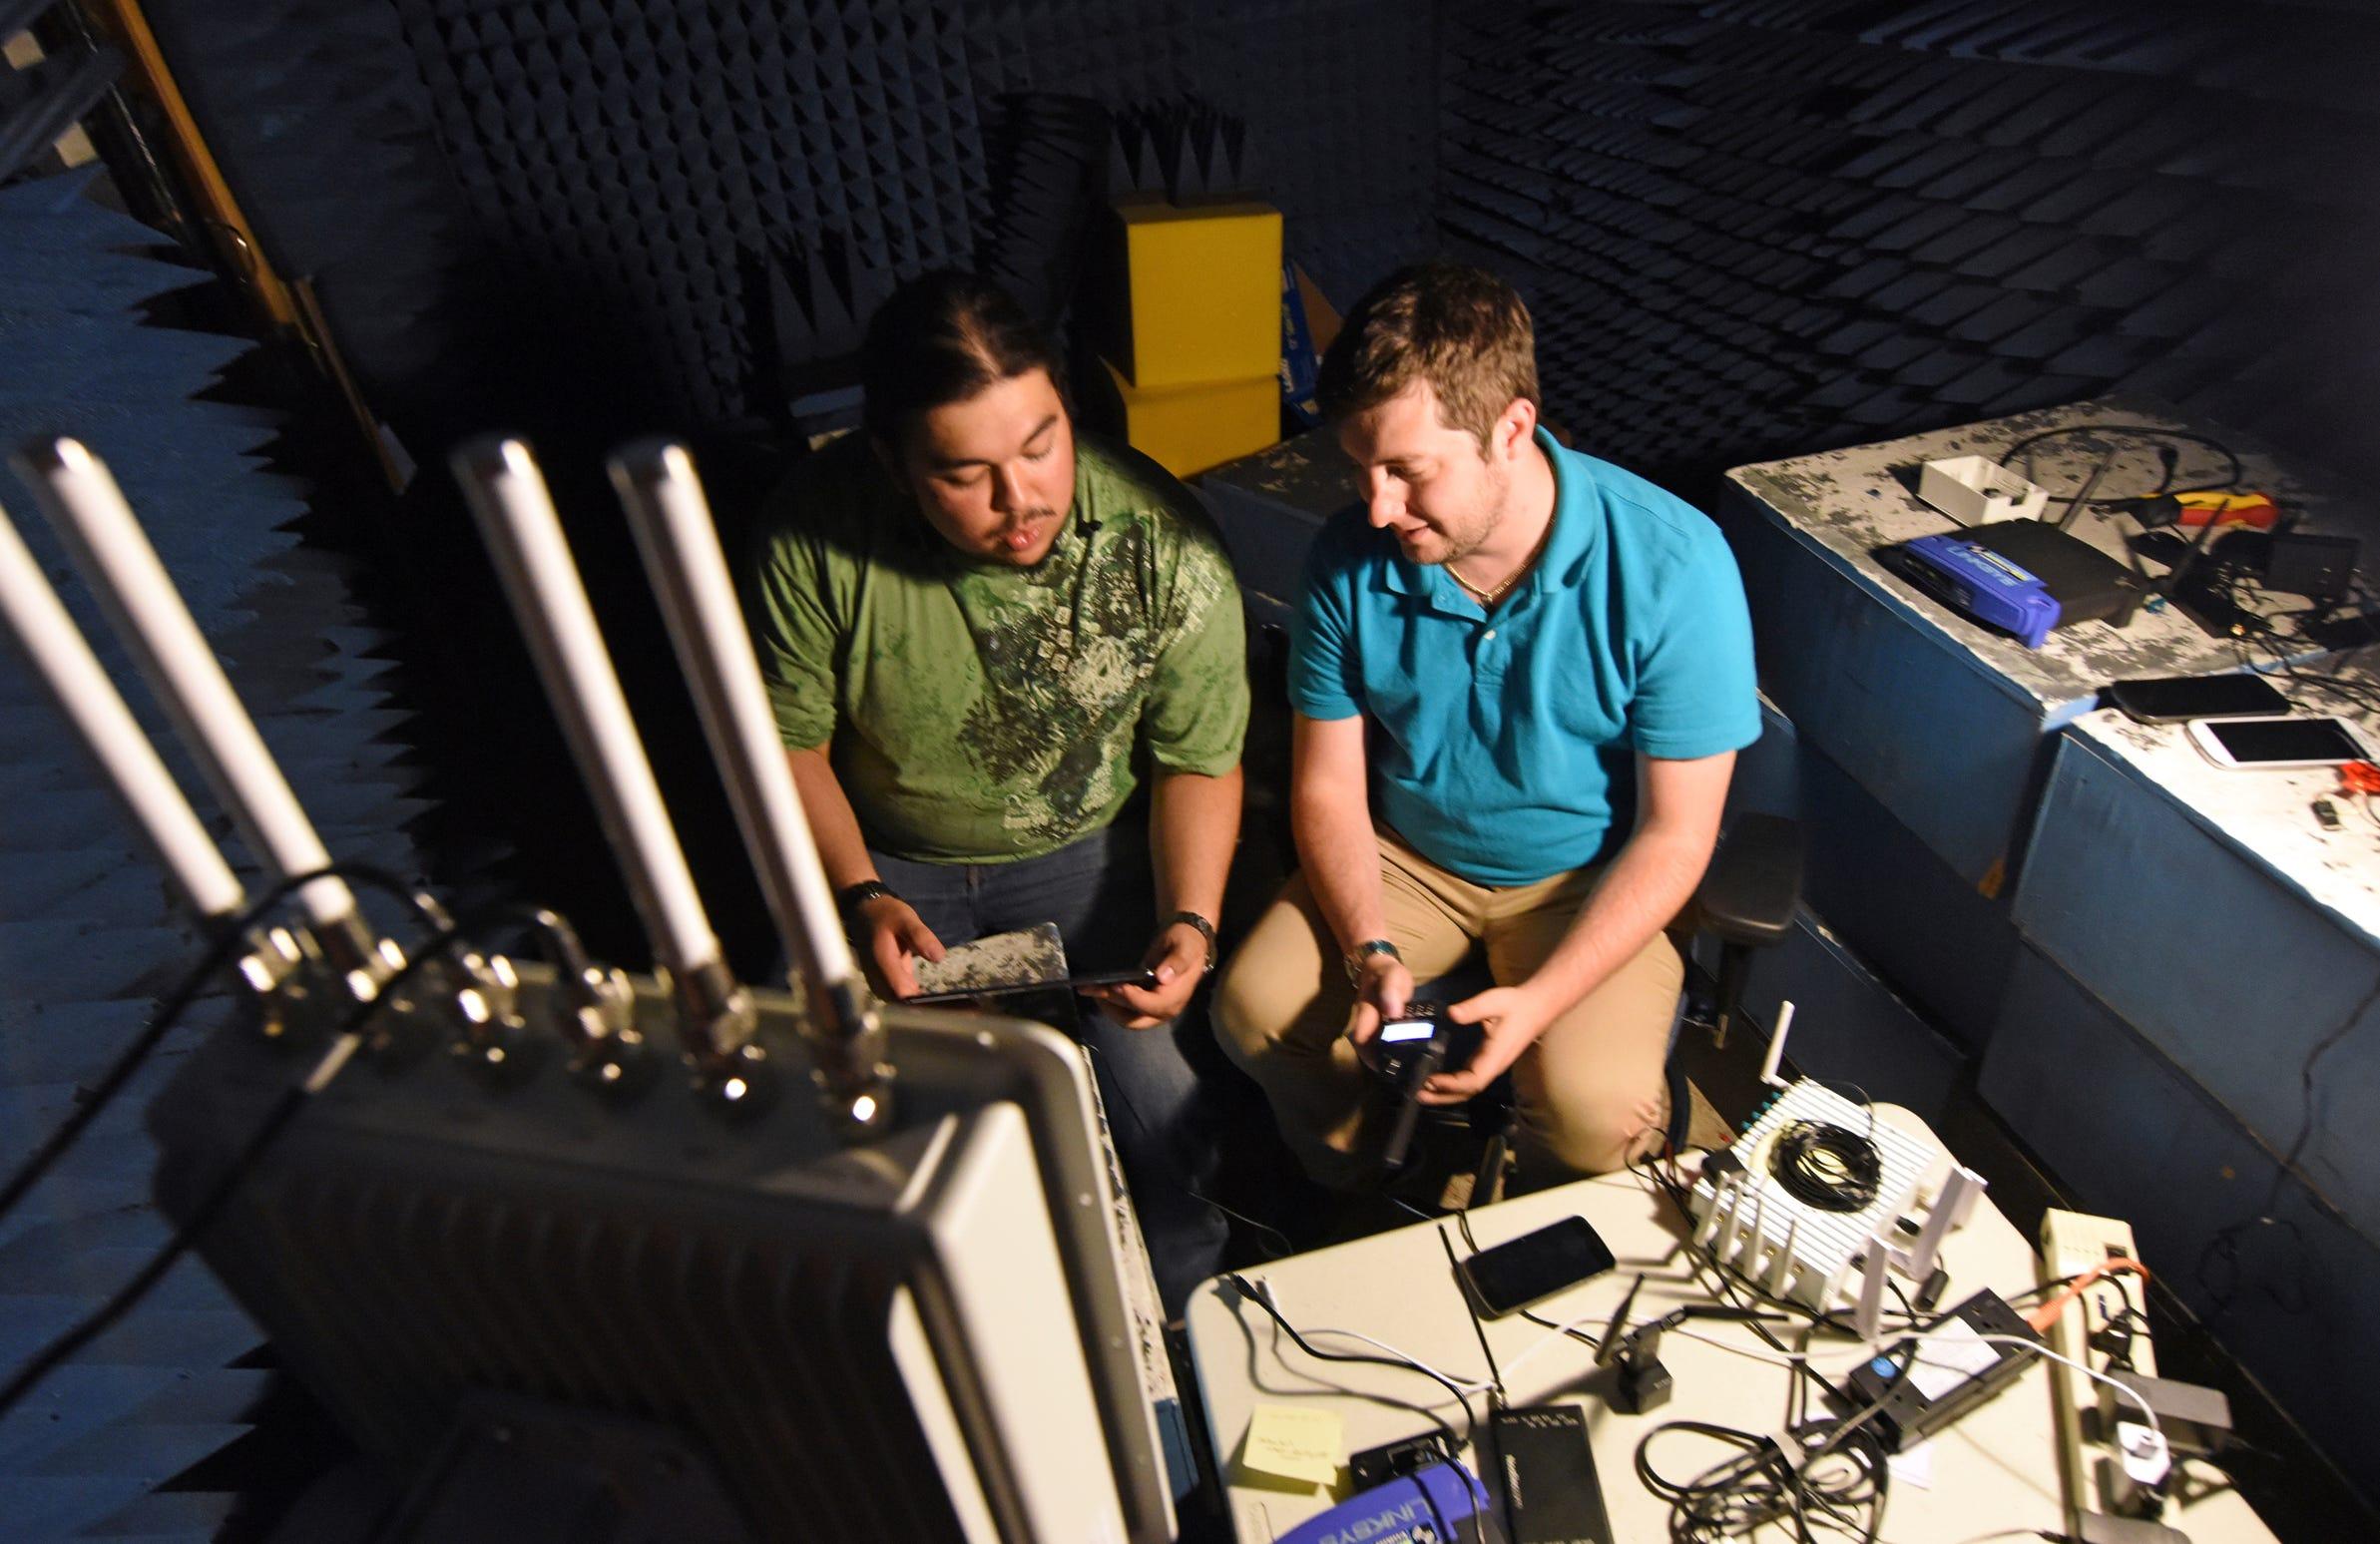 INL interns Armando Juarez Jr., left, and Jordan Mussman work in the Faraday room in a cybersecurity electronics lab in Idaho Falls, Idaho.